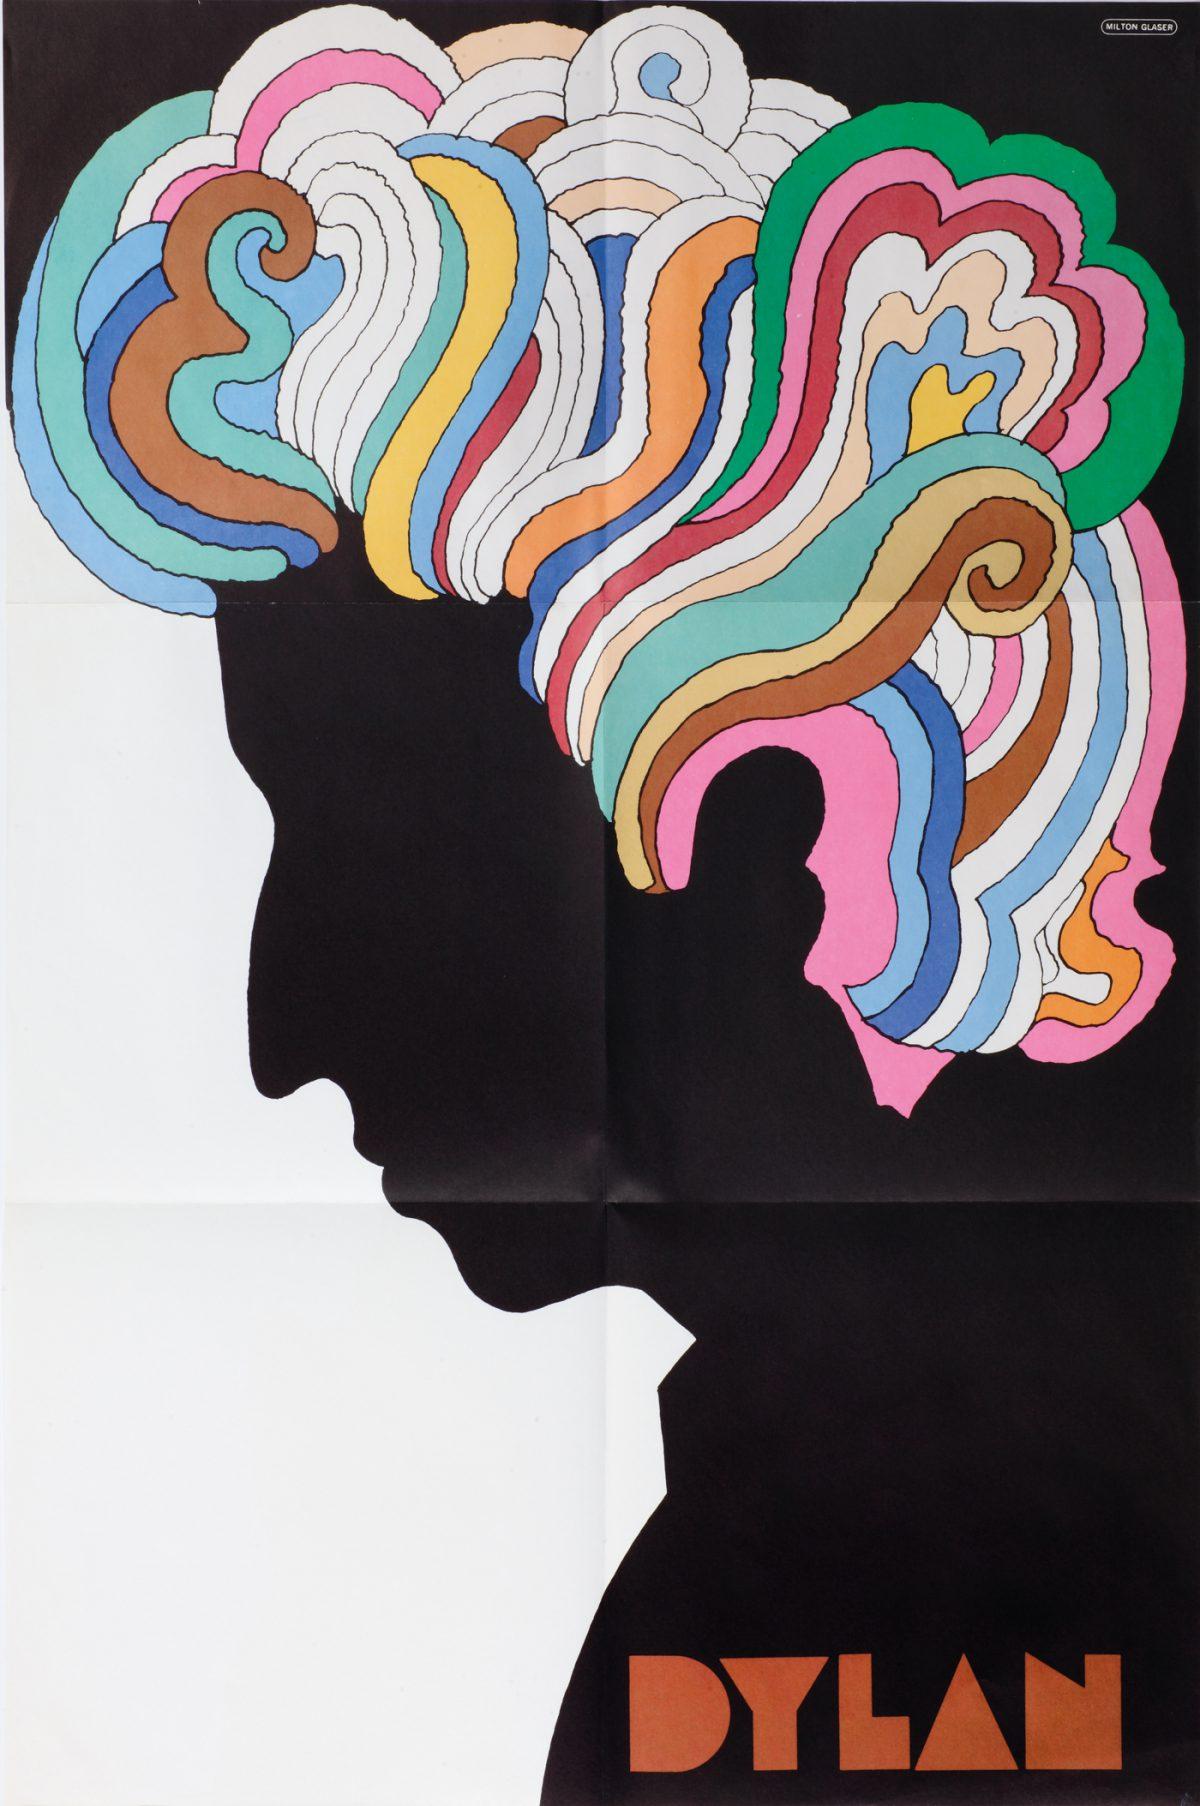 "Milton Glaser (American, b. 1929). Dylan, 1966. Poster insert, Bob Dylan,""Bob Dylan's Greatest Hits""; Offset print; 83.3 x 56 cm; Columbia Records; Gerrit Terstiege © Milton Glaser. Photo: Andreas Sütterlin"